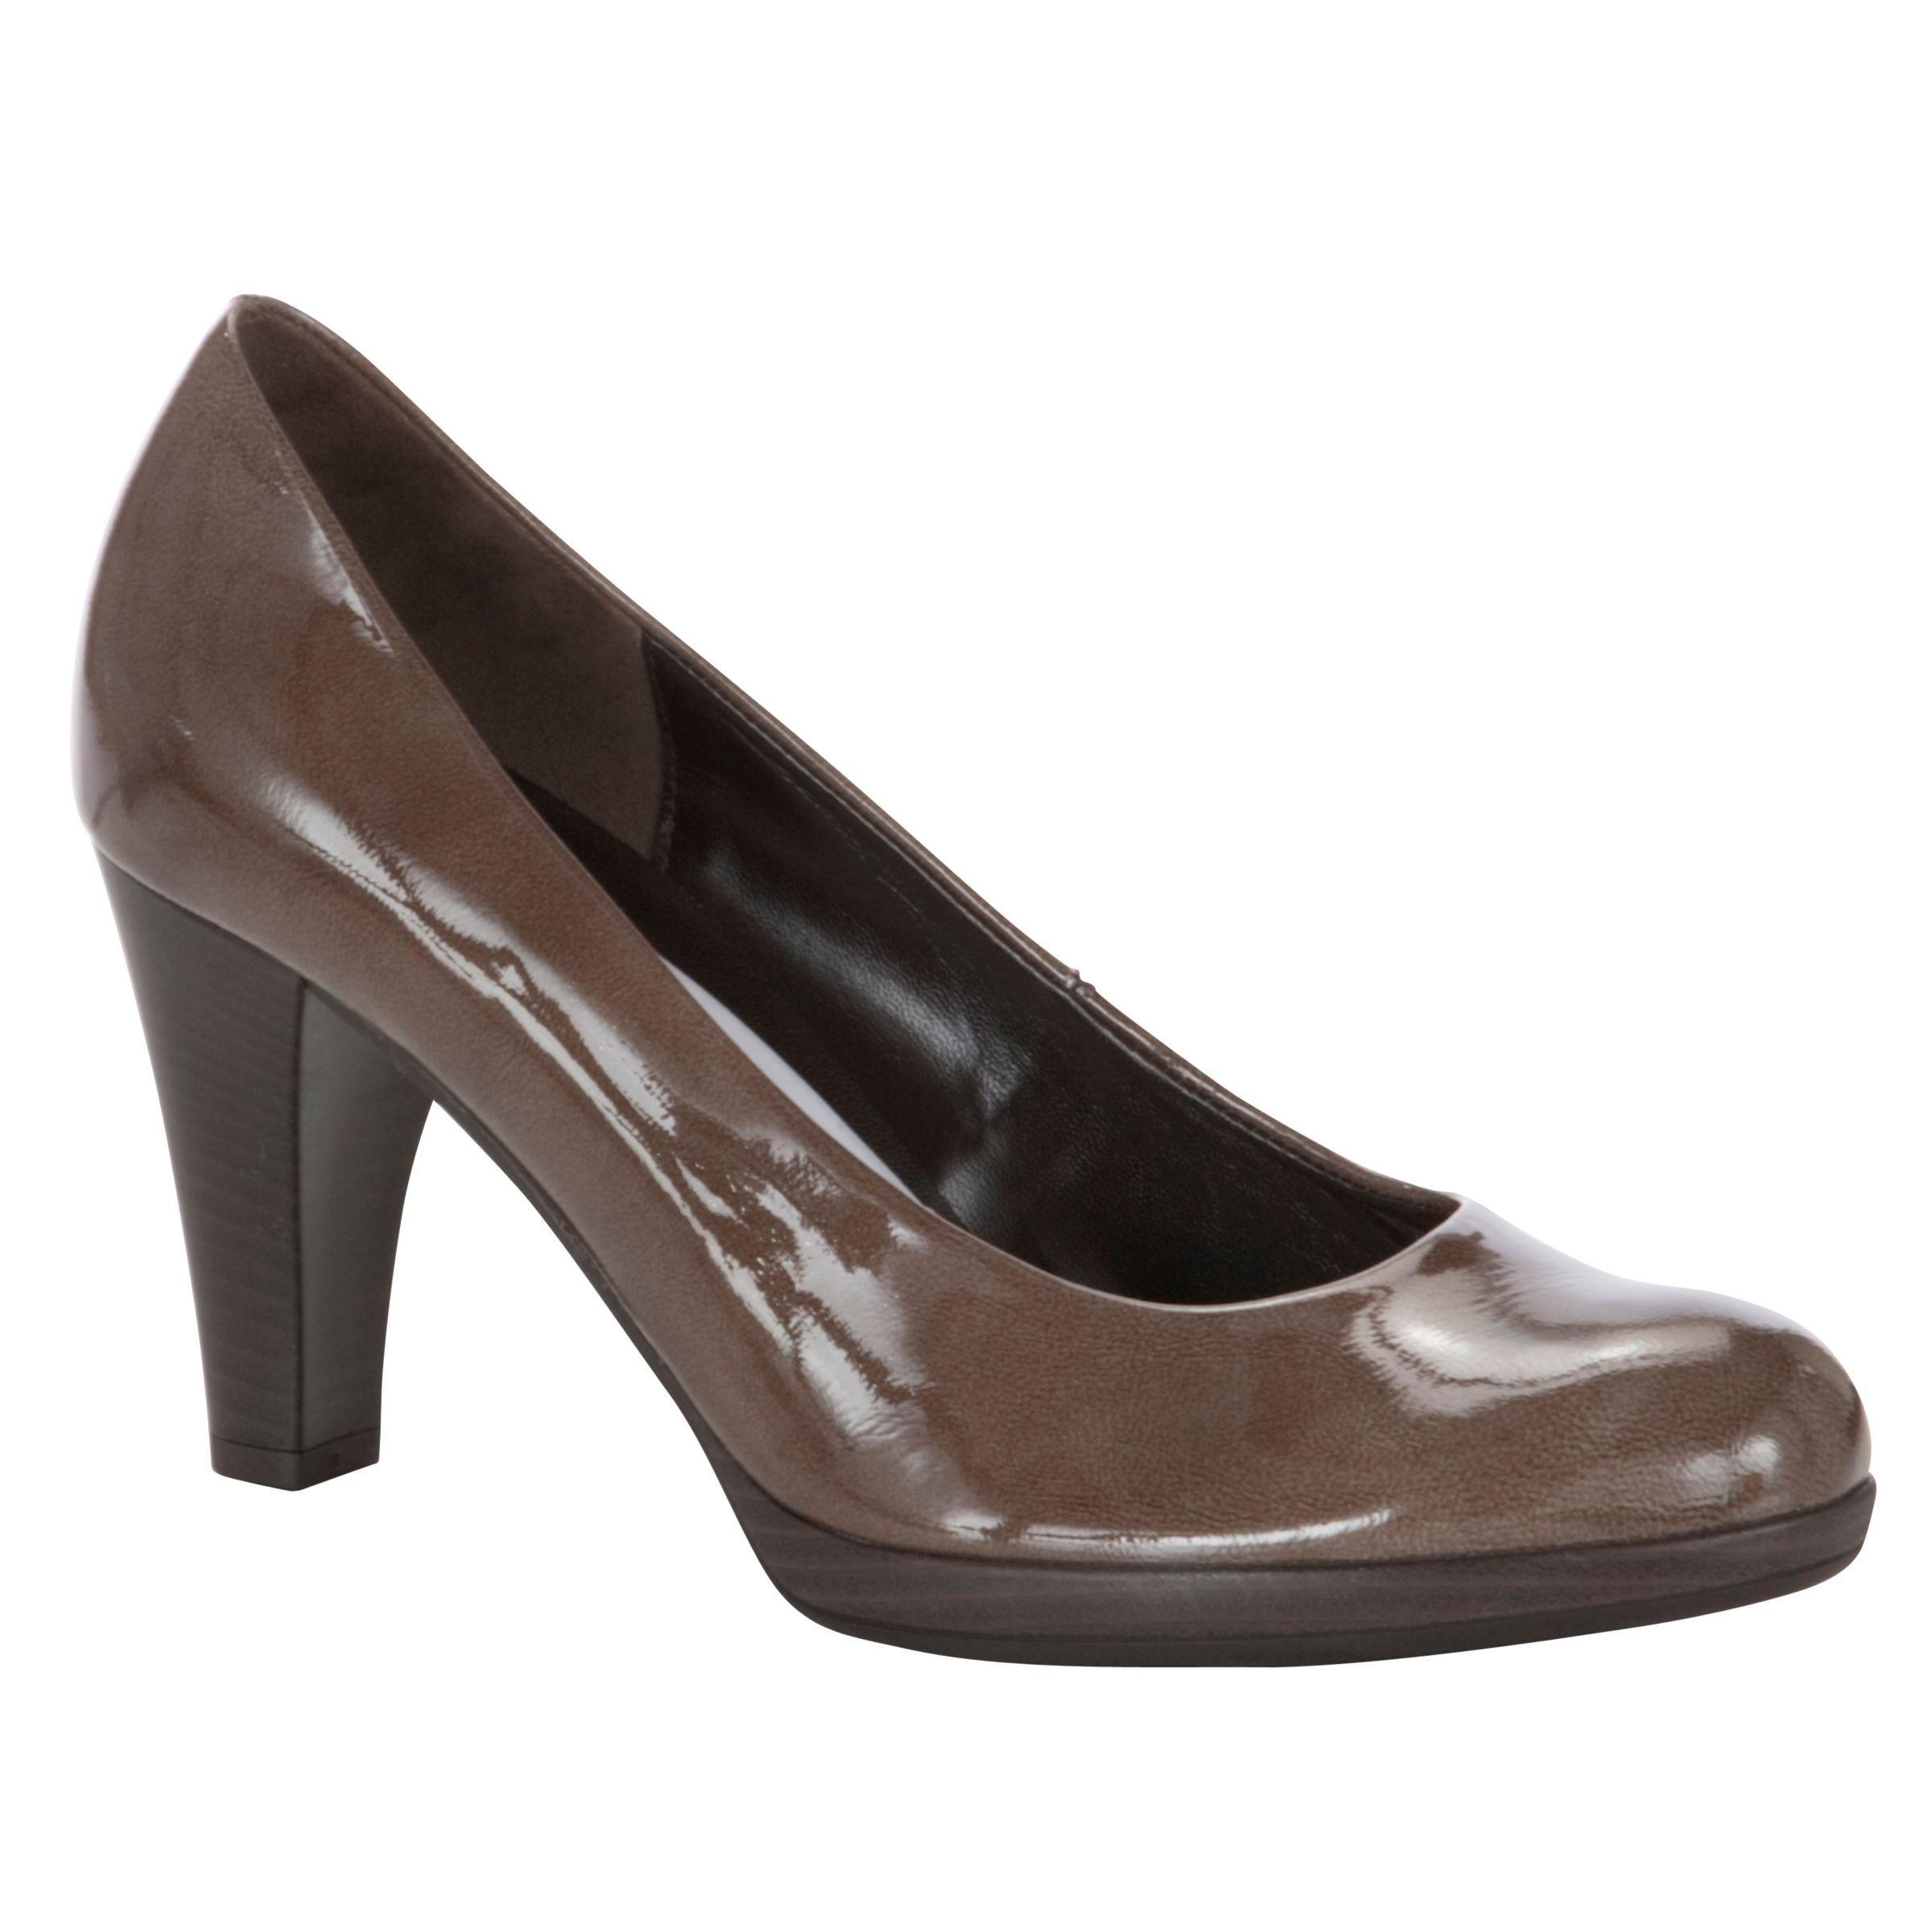 Gabor Soria Patent Cone Heel Court Shoes, Taupe